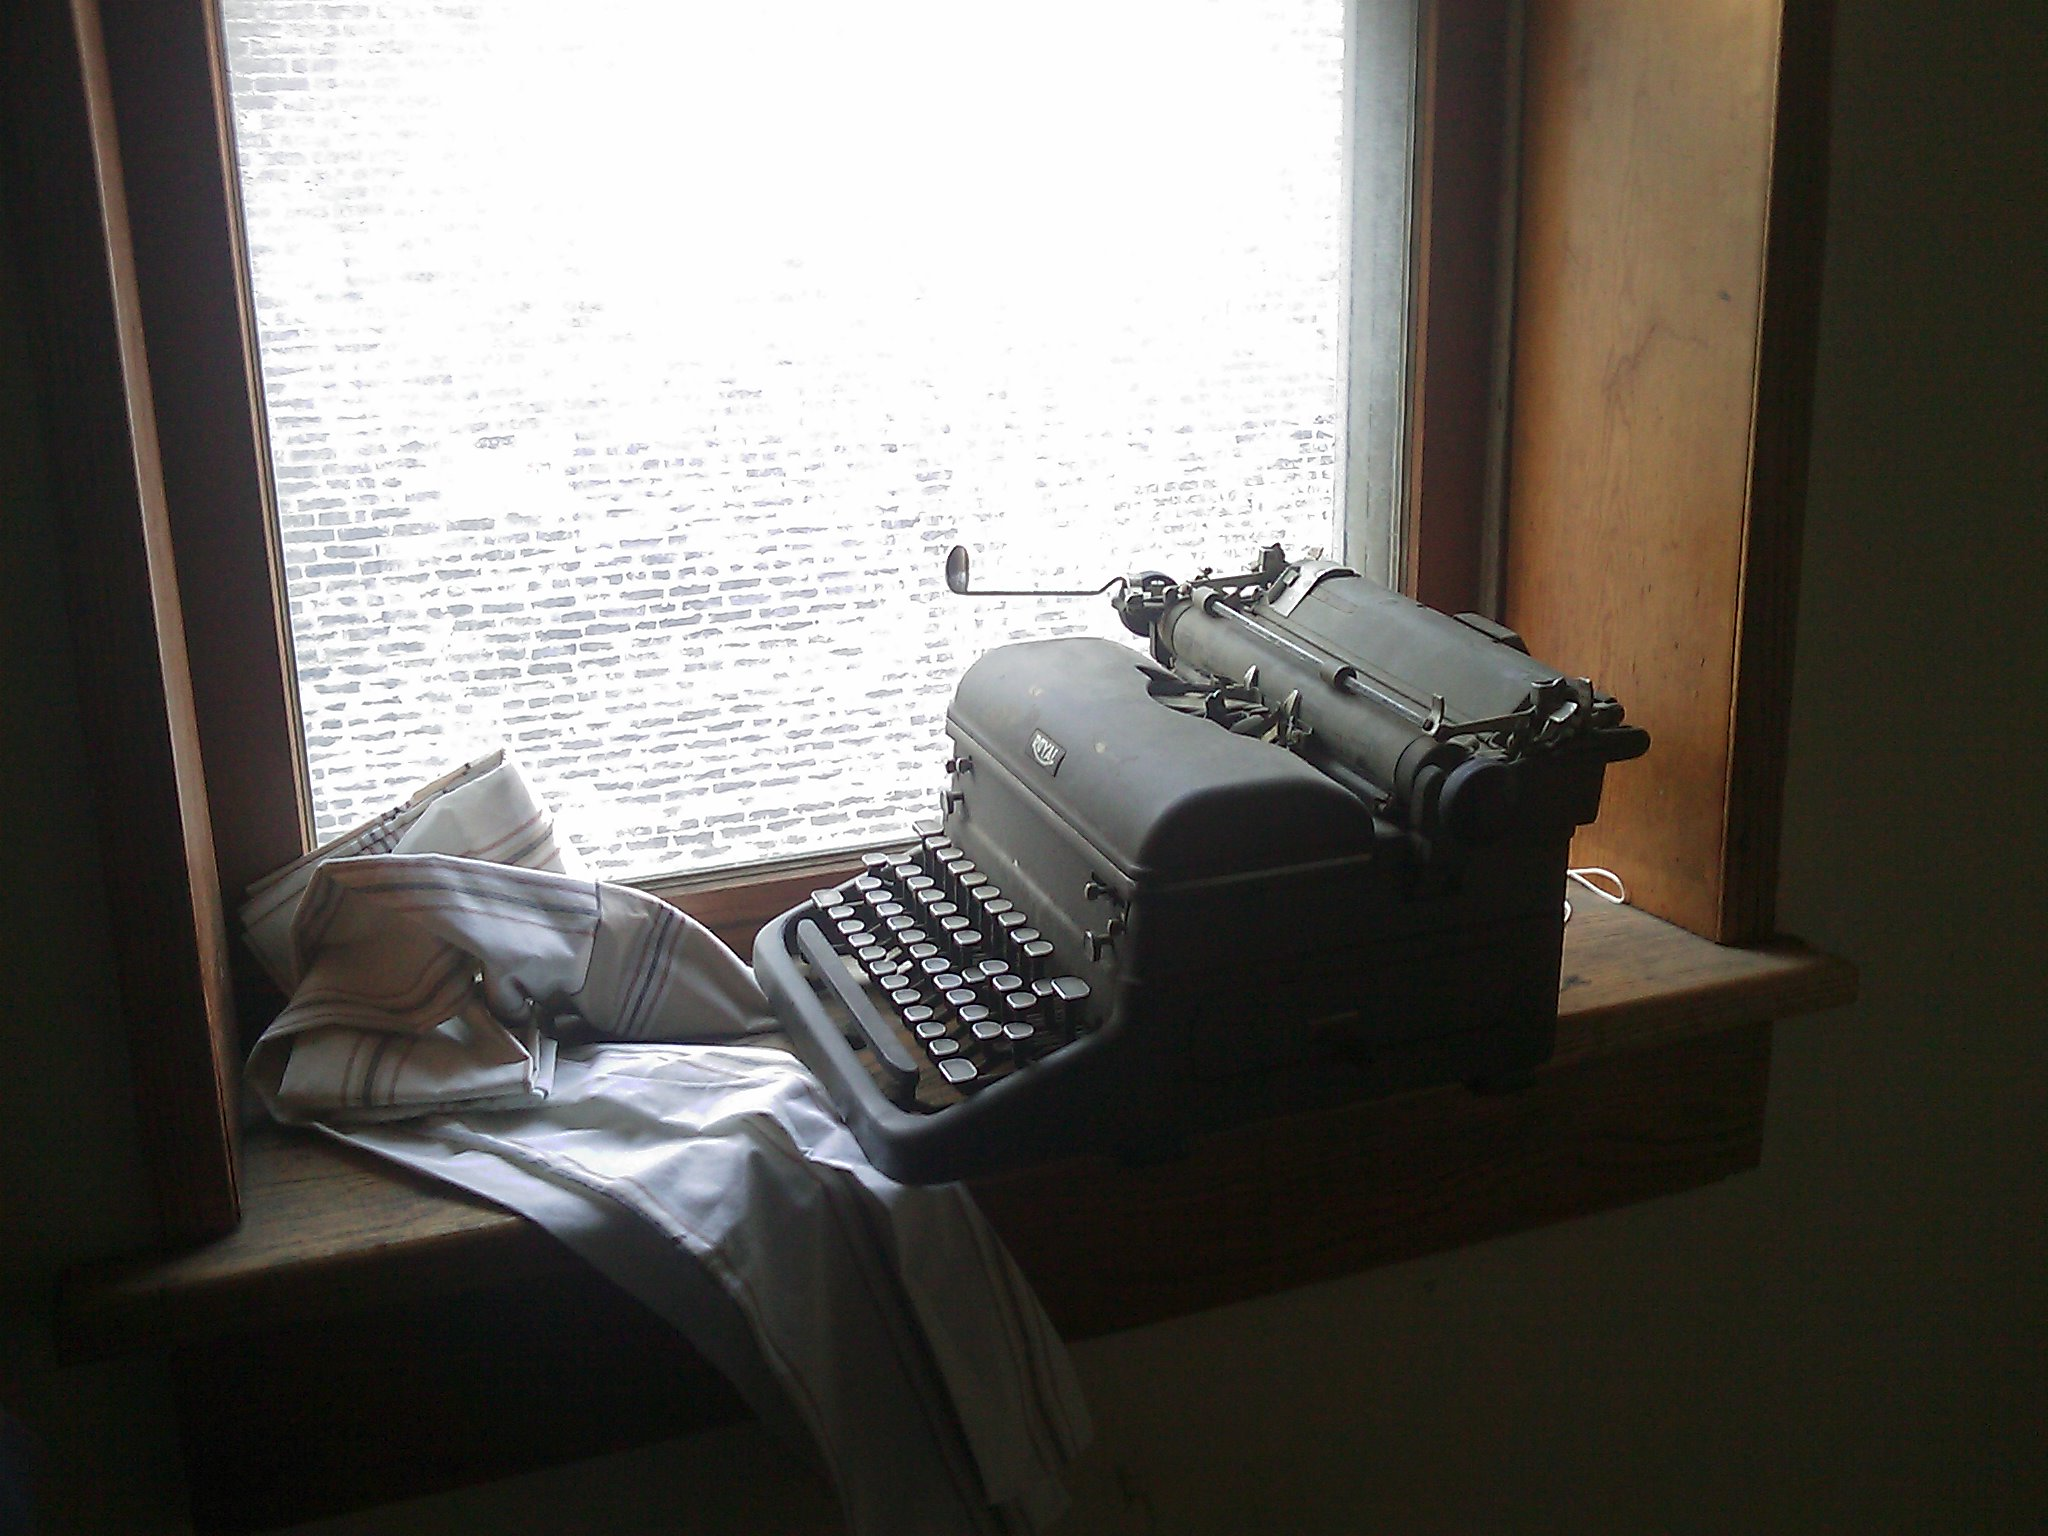 Old Royal typewriter sitting on a windowsill